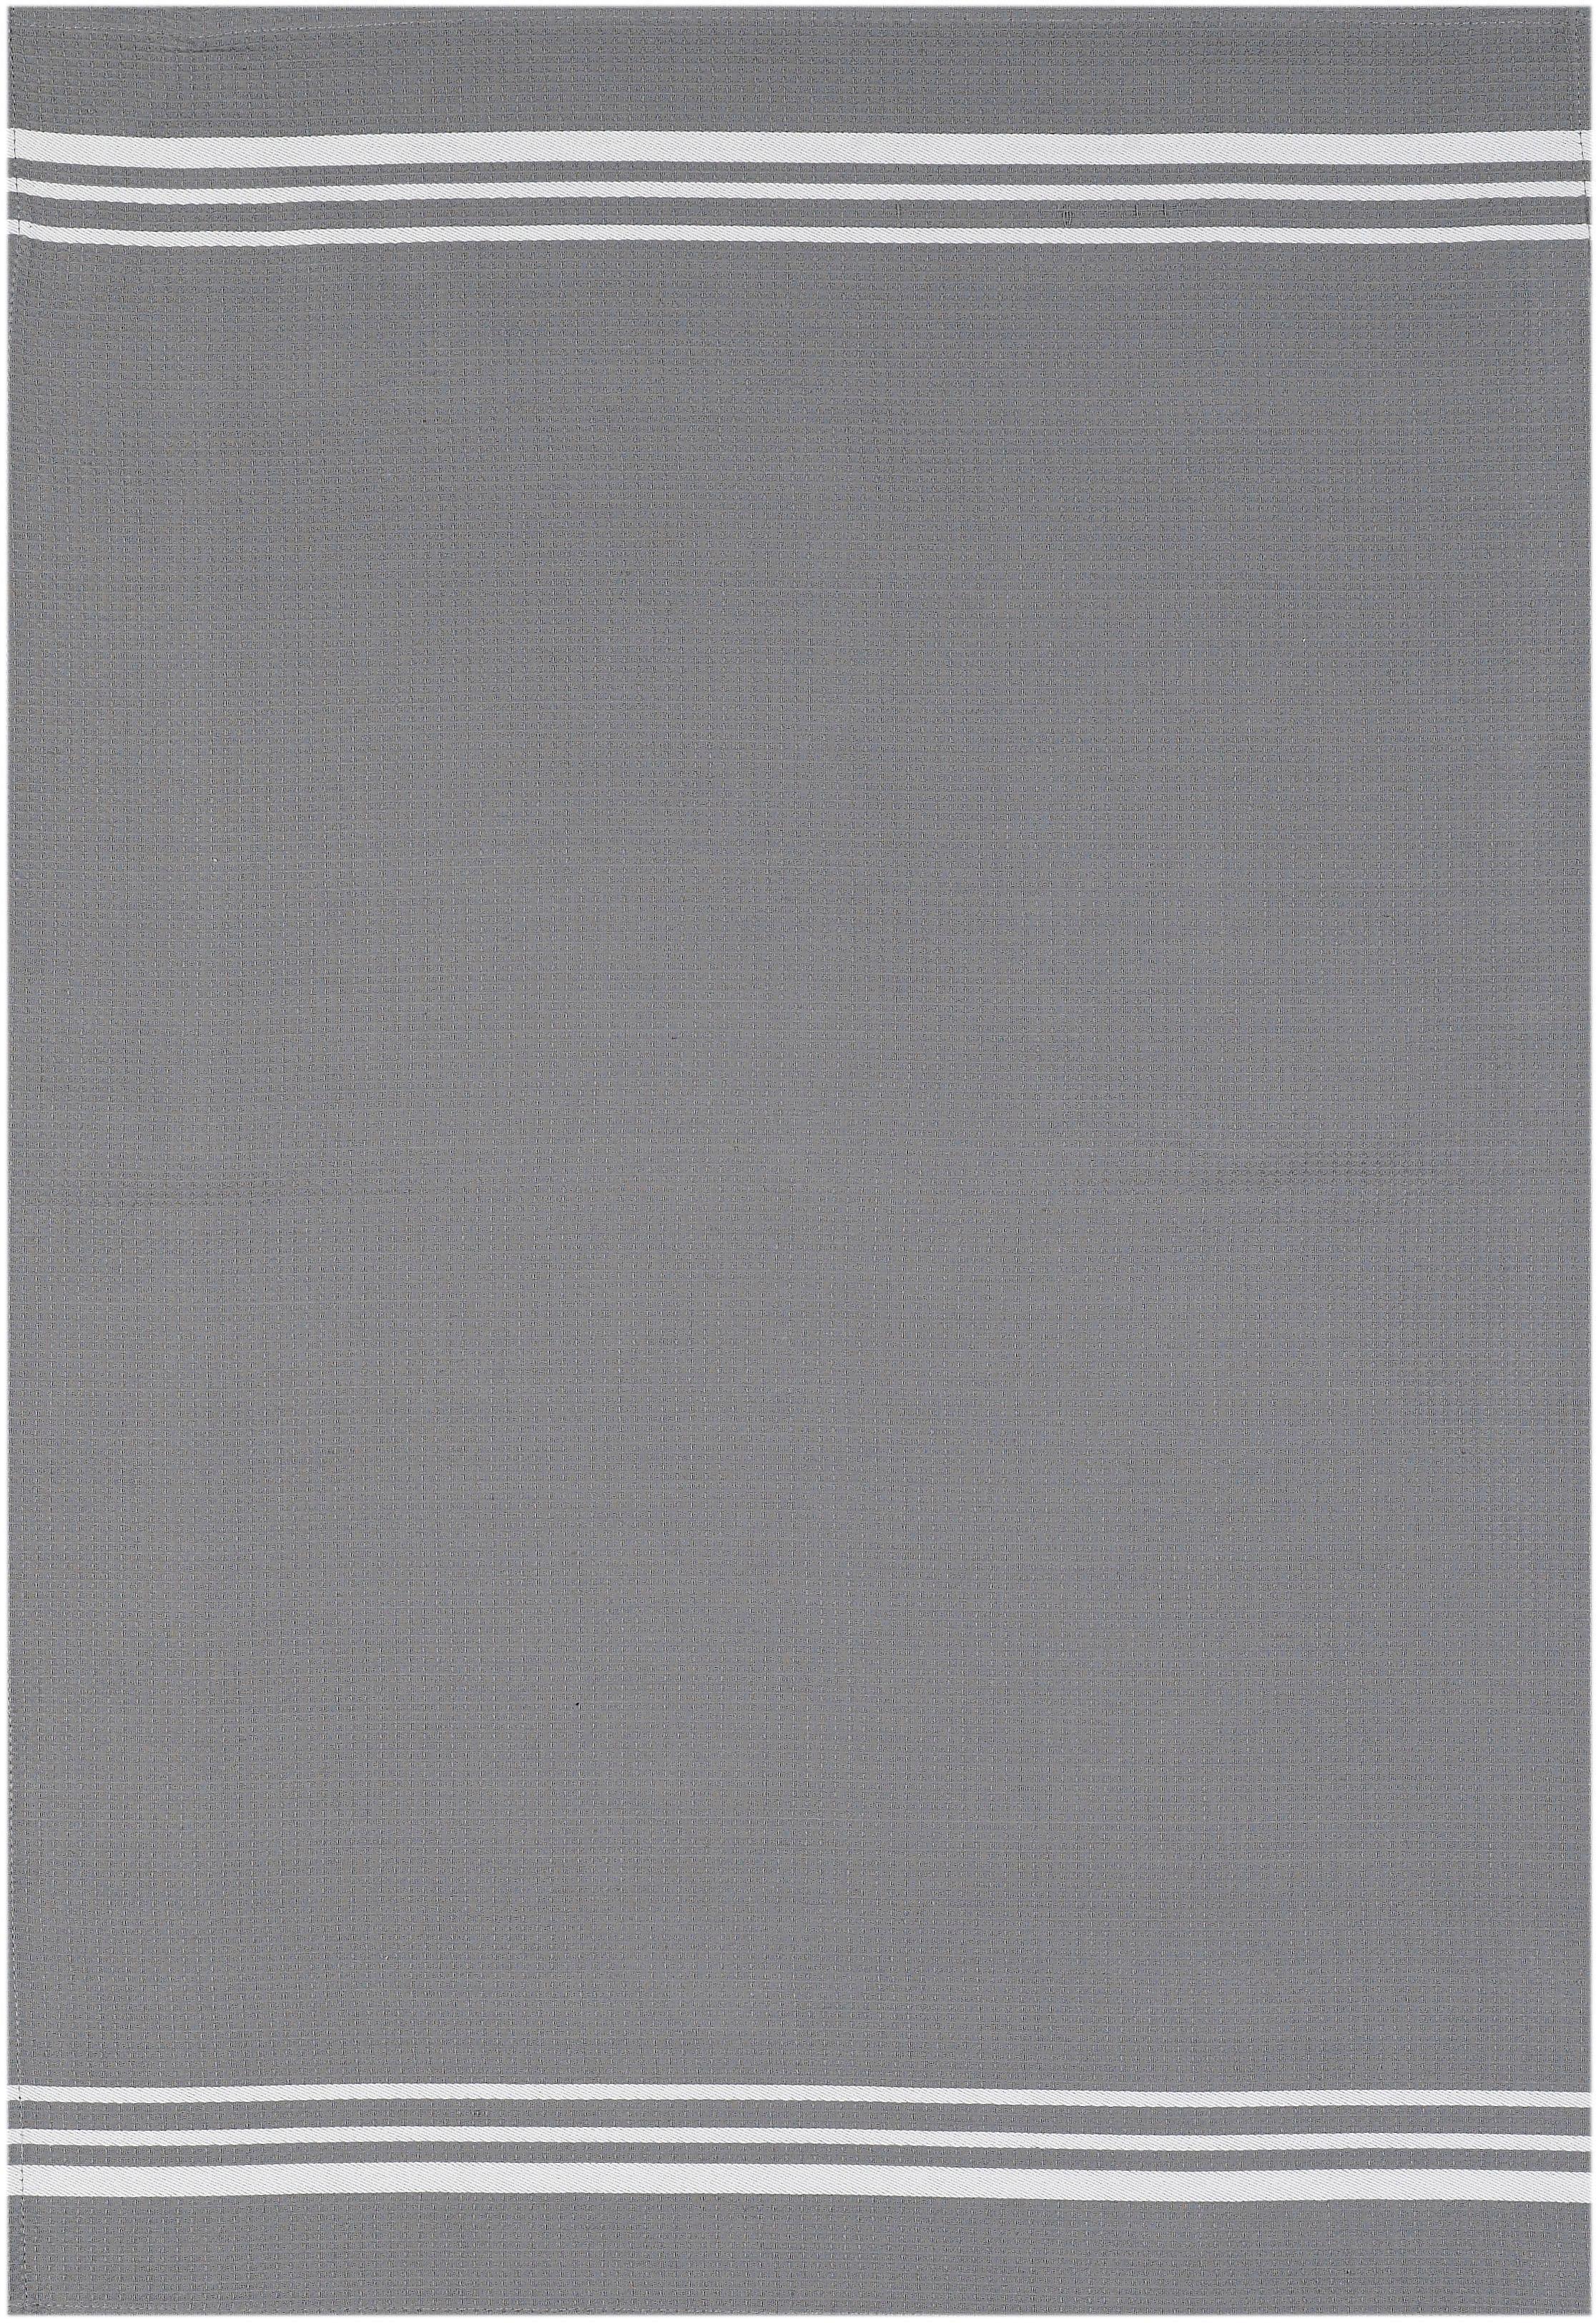 stuco Geschirrtuch Waffel, farbig, (Set, 3 tlg.) grau Geschirrtücher Küchenhelfer Haushaltswaren